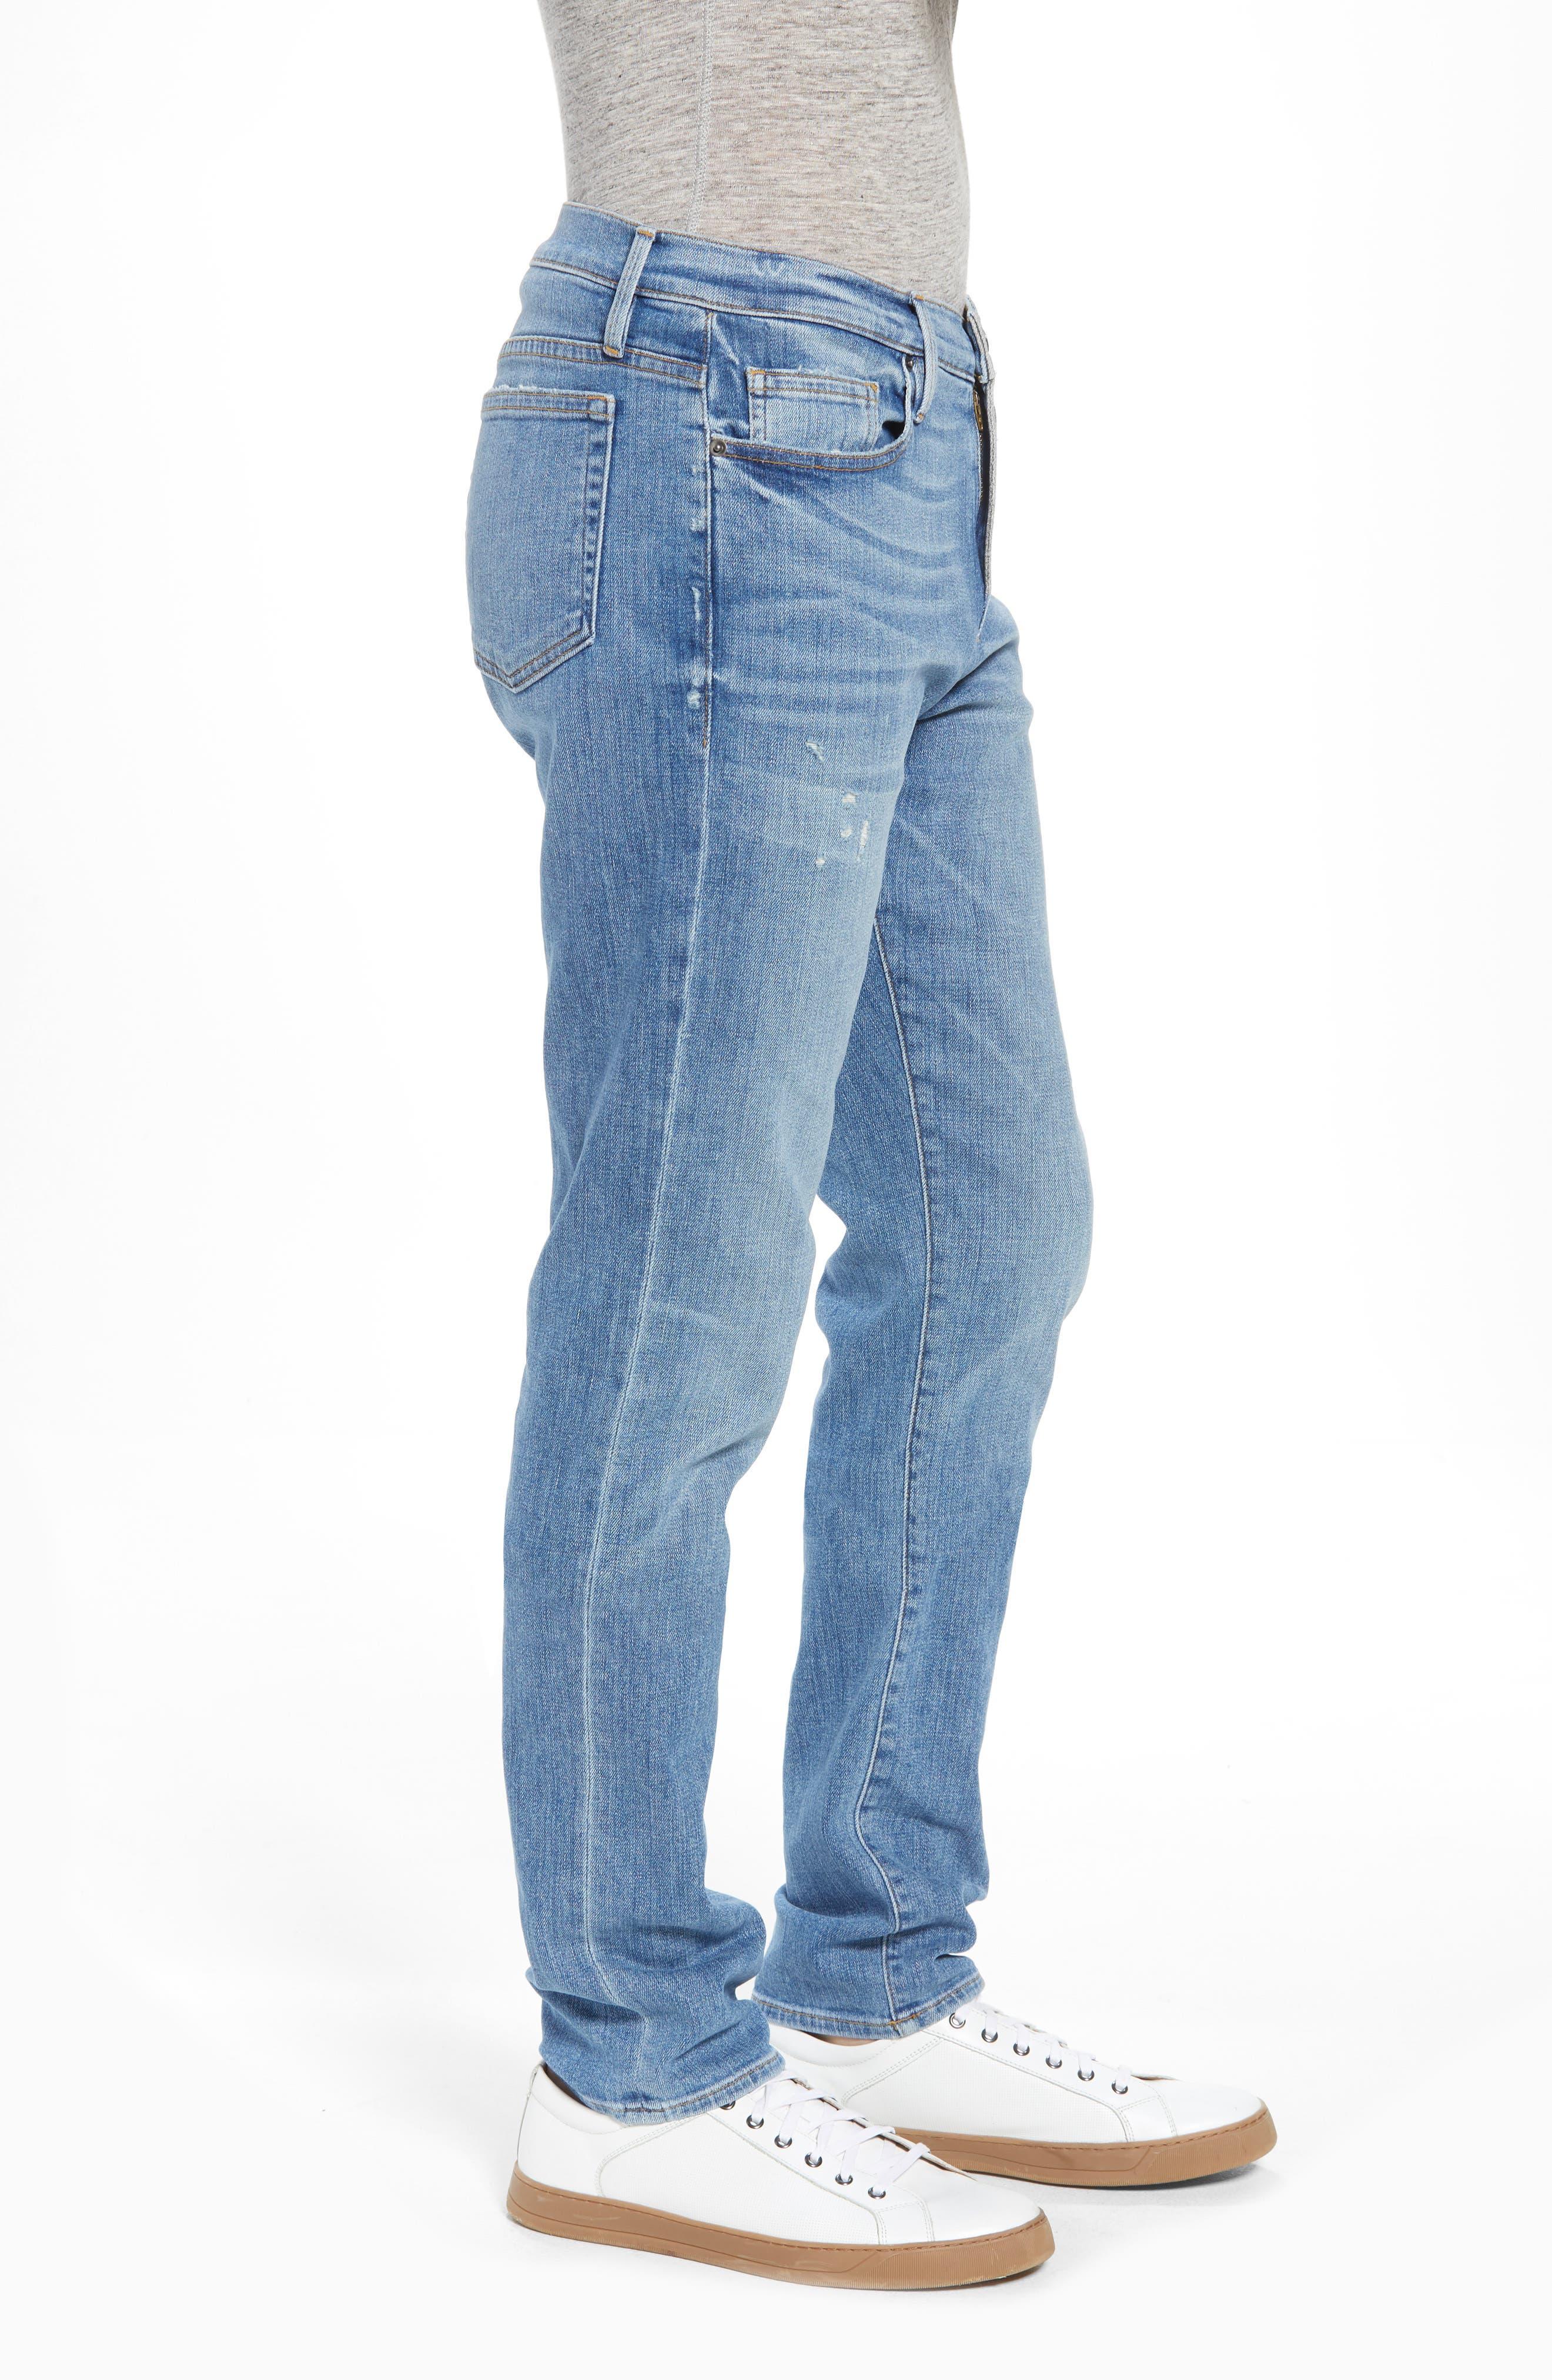 L'Homme Slim Straight Fit Jeans,                             Alternate thumbnail 3, color,                             Russel Cave